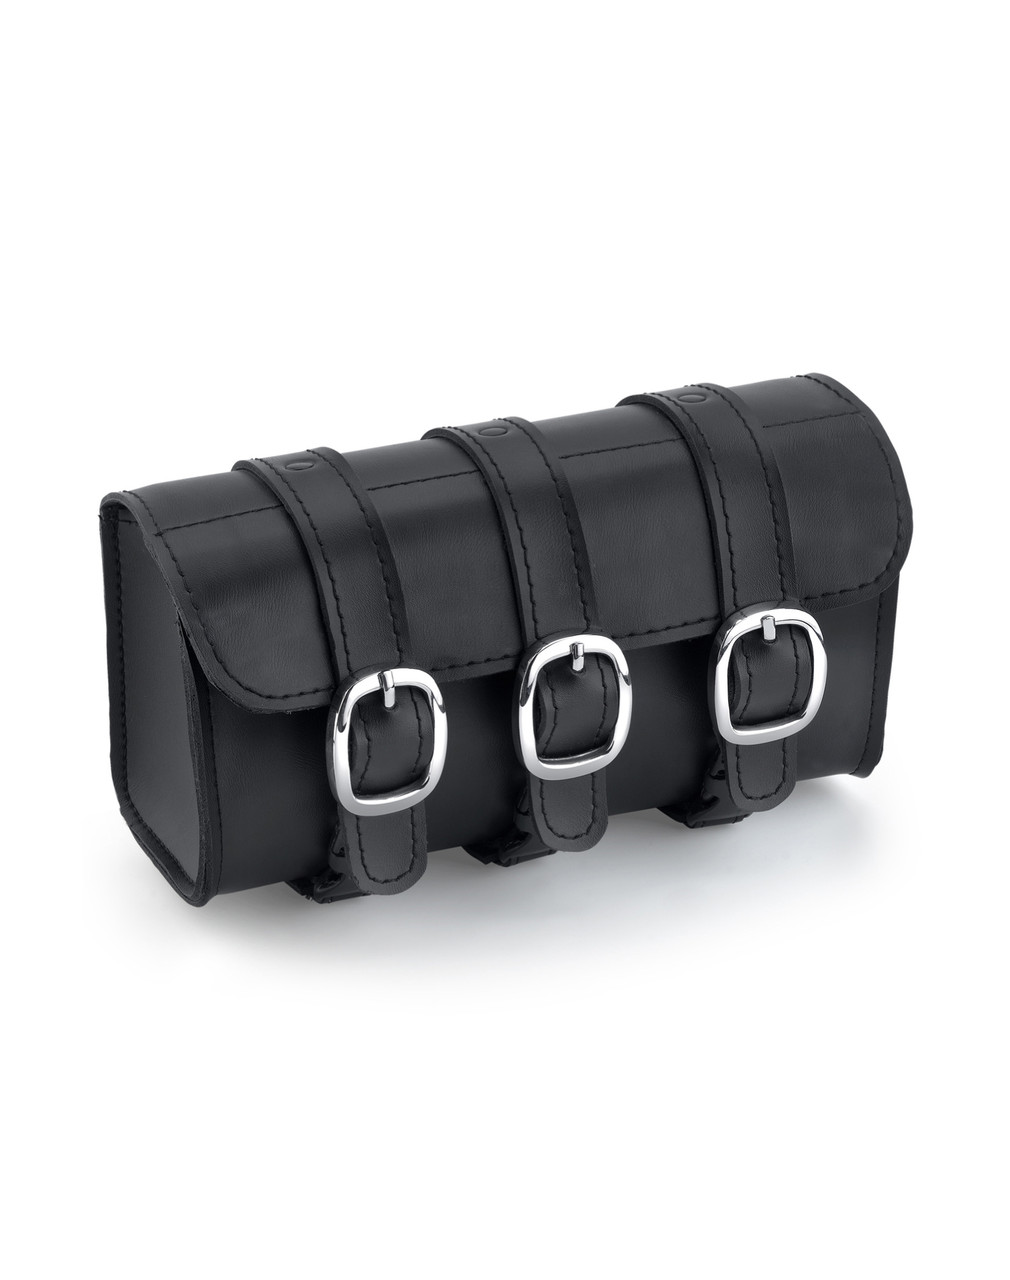 Trianion Plain Motorcycle Tool Bag For Harley Davidson Main Bag View